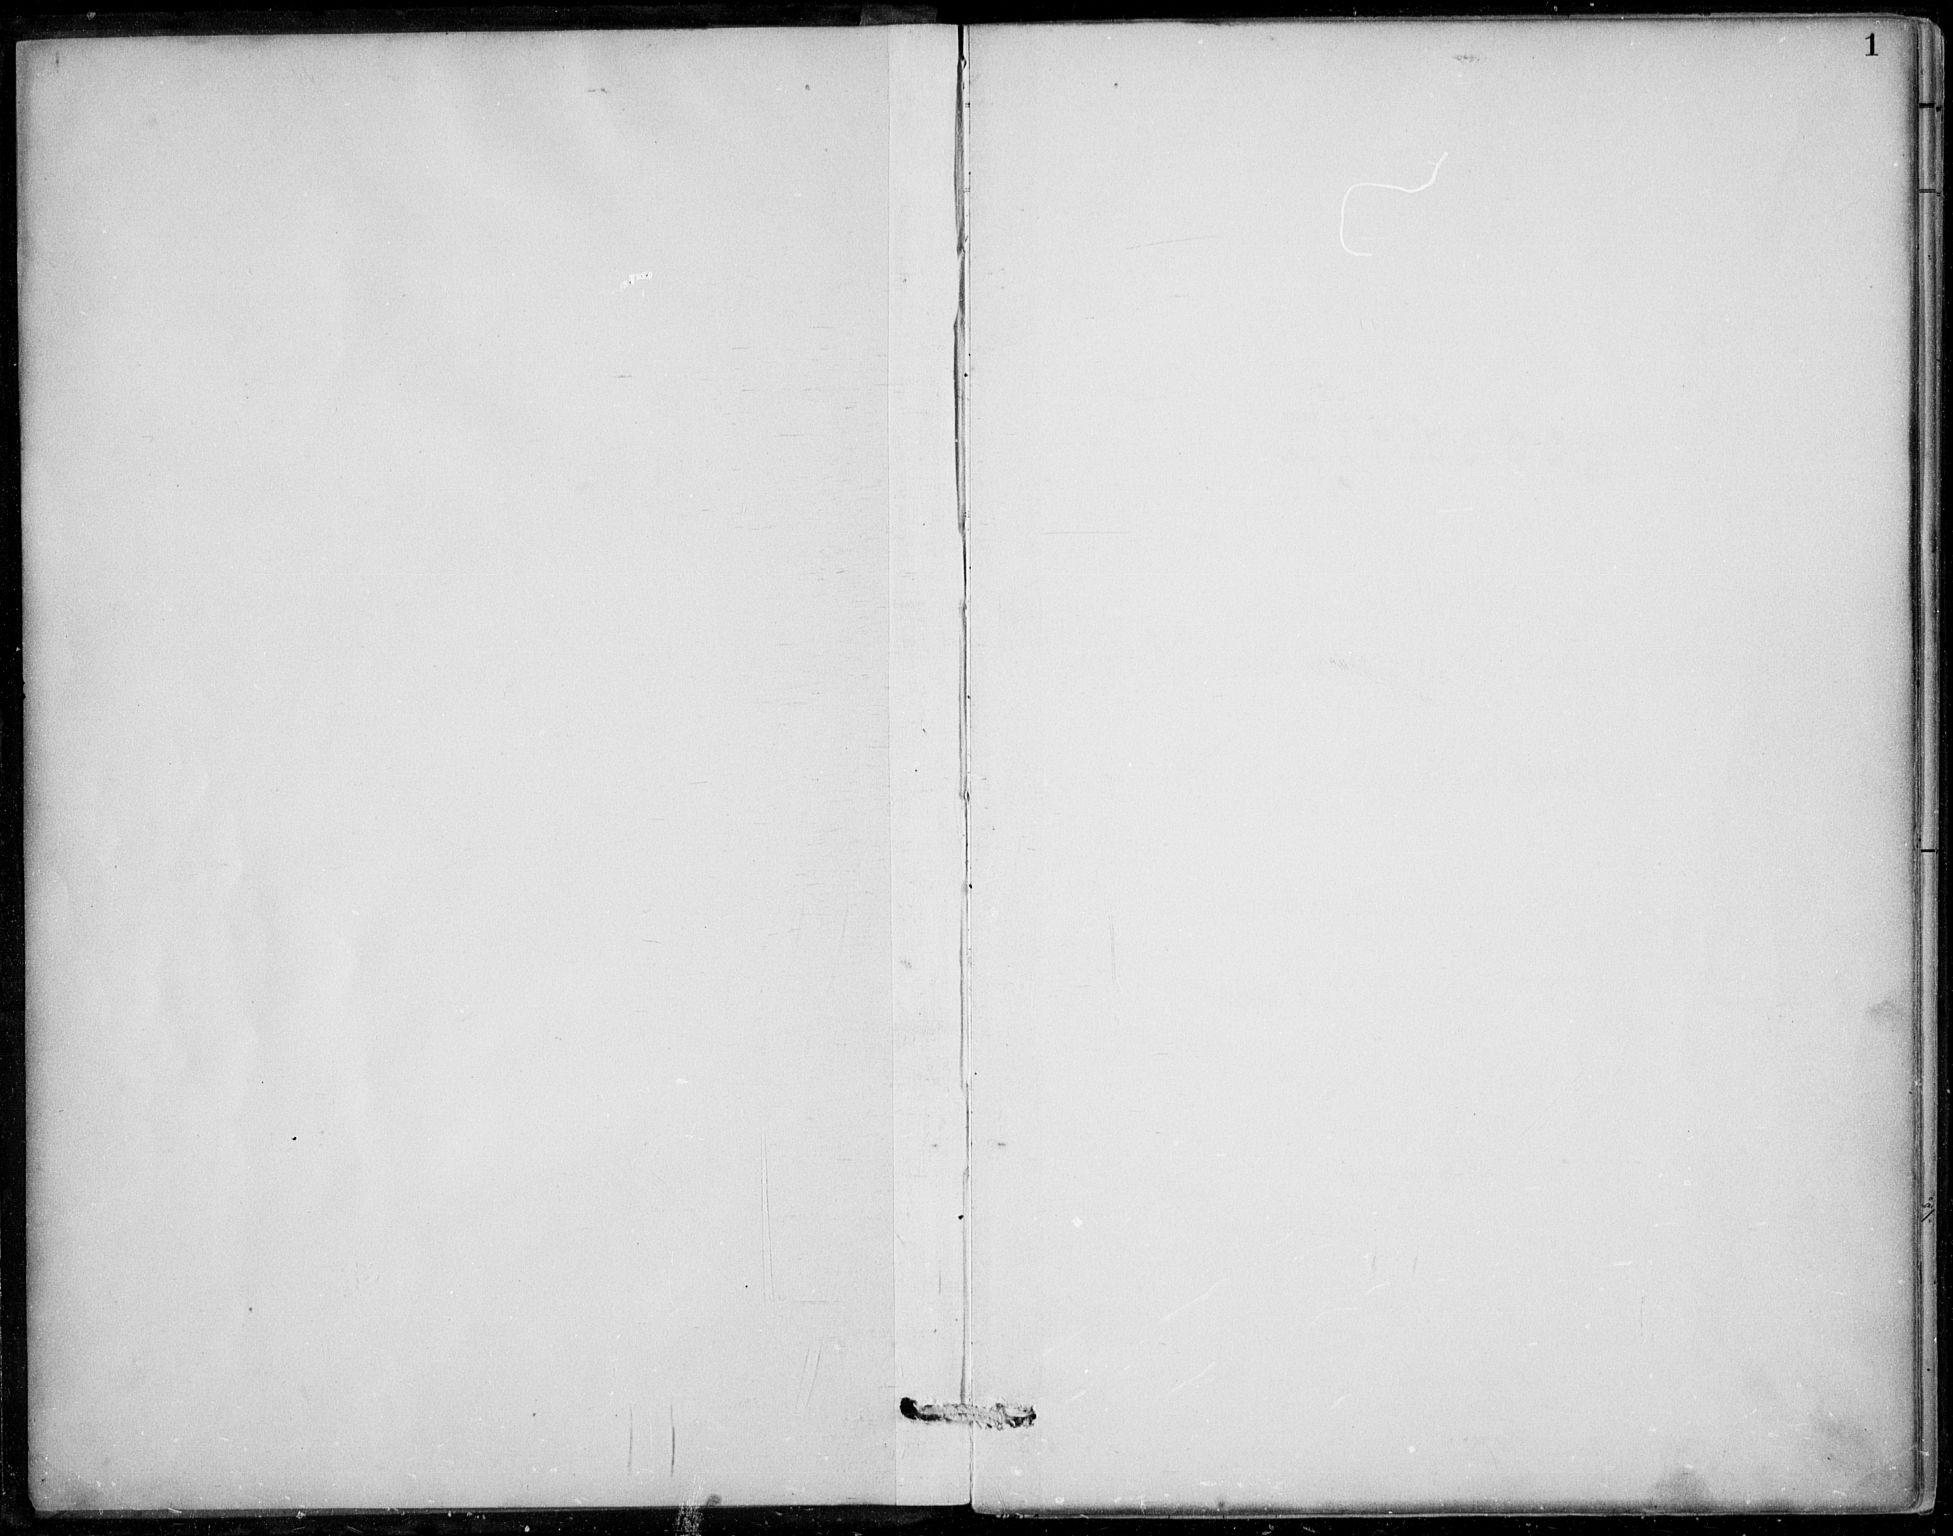 SAB, Strandebarm sokneprestembete, H/Haa: Ministerialbok nr. D  1, 1886-1912, s. 1